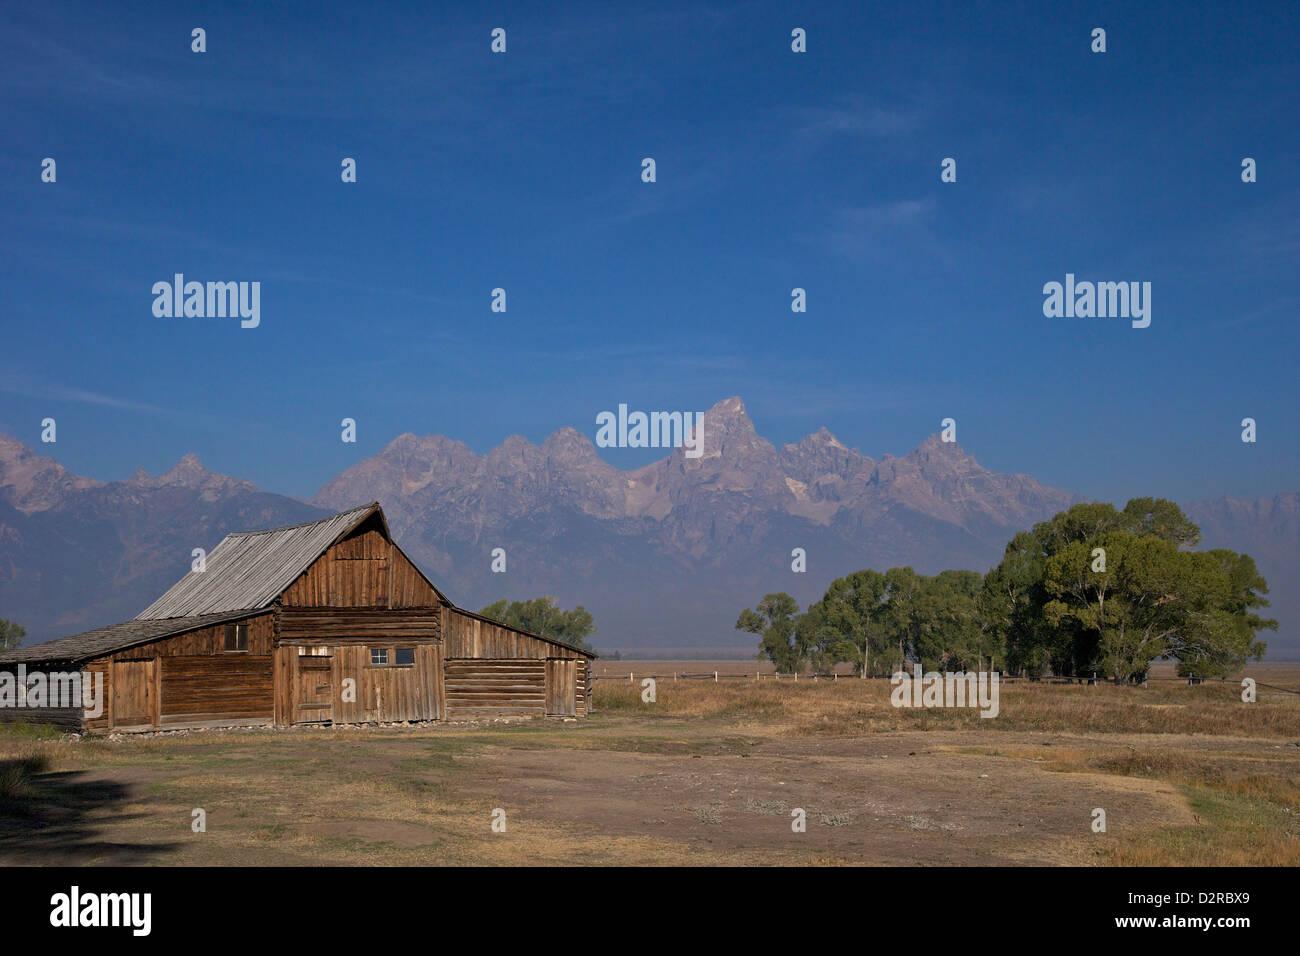 Scheune, Thomas Alma und Lucille Moulton Homestead, Mormone Zeile Historic District, Grand-Teton-Nationalpark, Wyoming, Stockbild